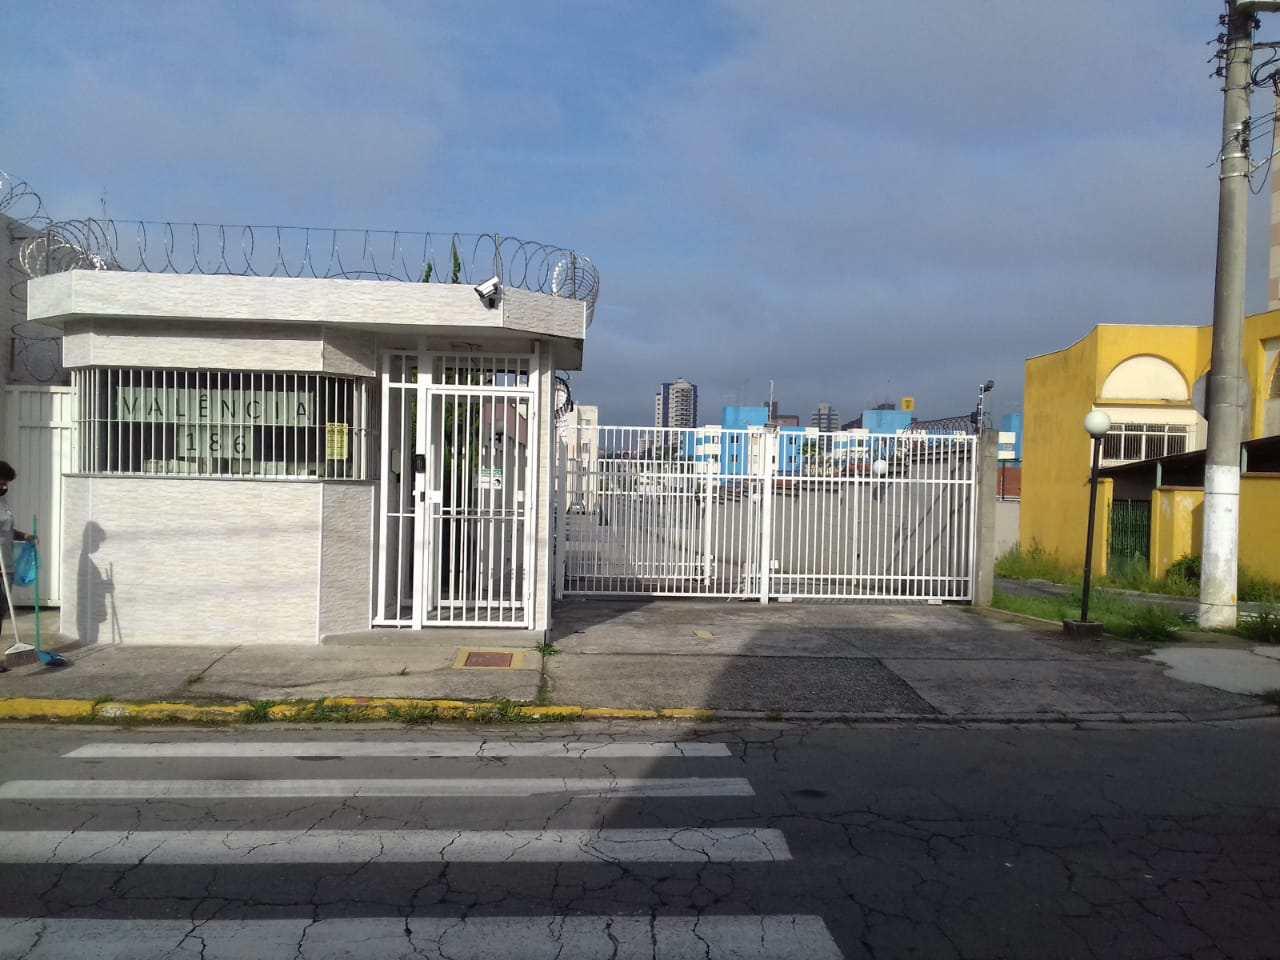 Apartamento com 2 dorms, Vila Urupês, Suzano - R$ 180 mil, Cod: 1212